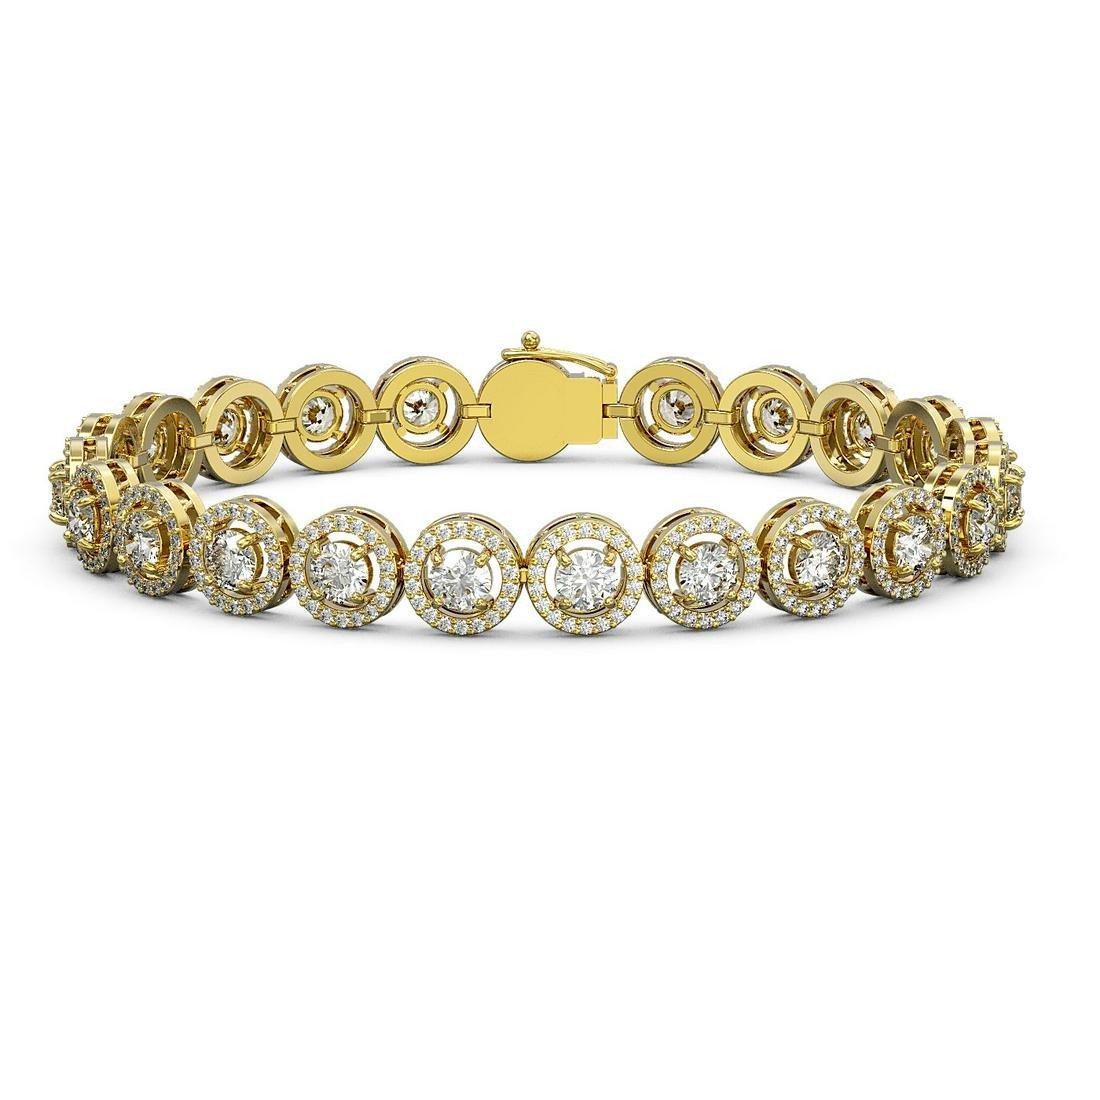 10.39 ctw Diamond Bracelet 18K Yellow Gold - REF-787Y8X